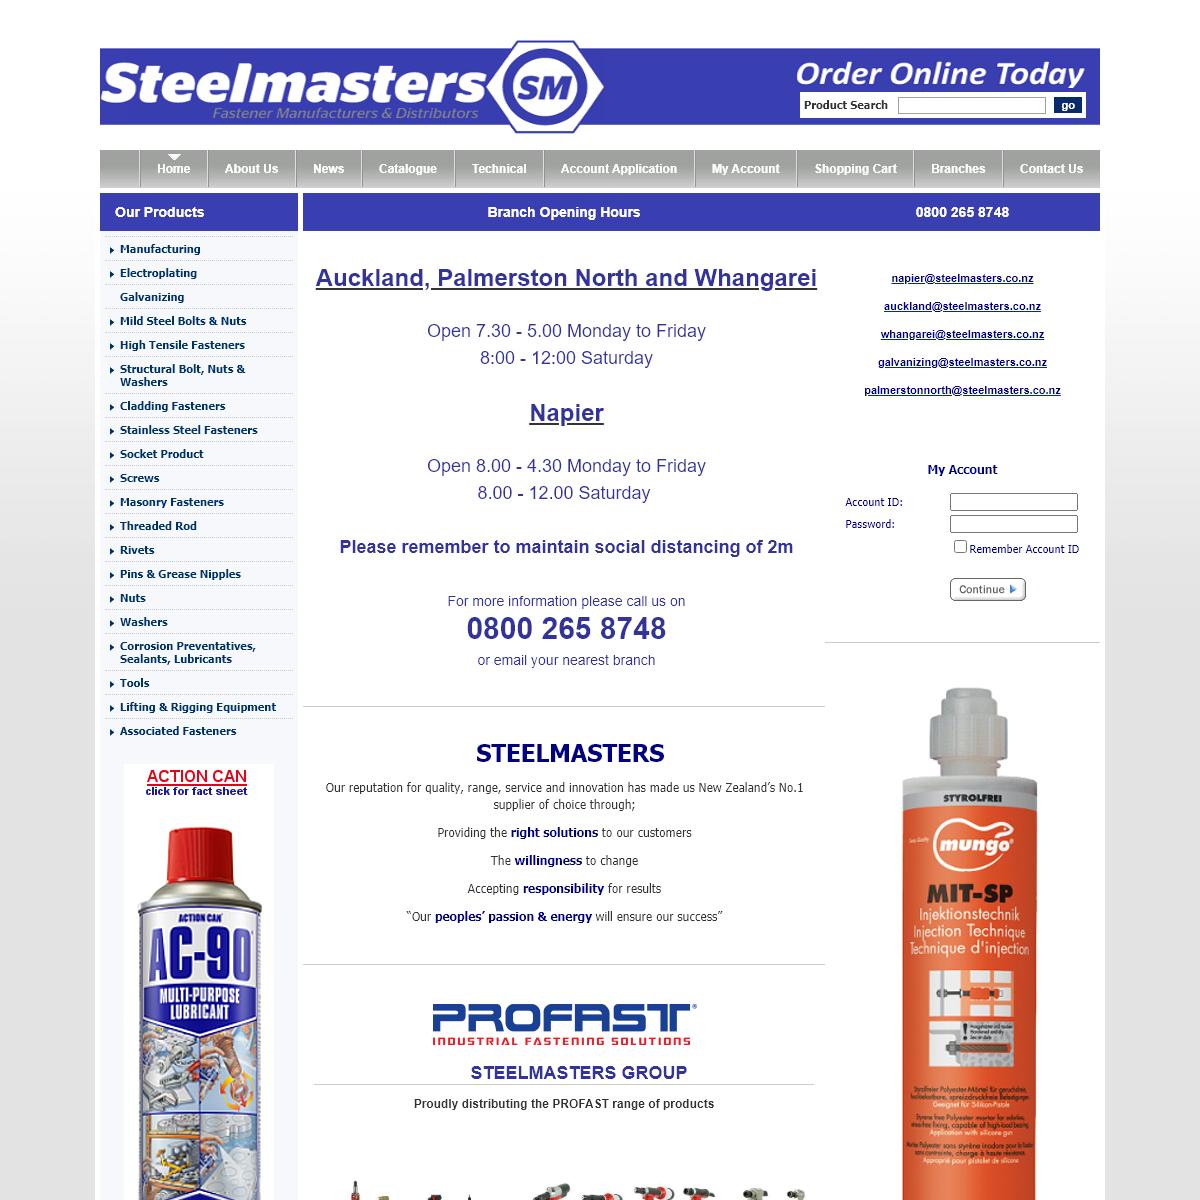 Fasteners Manufacturing & Distributors - Steelmasters